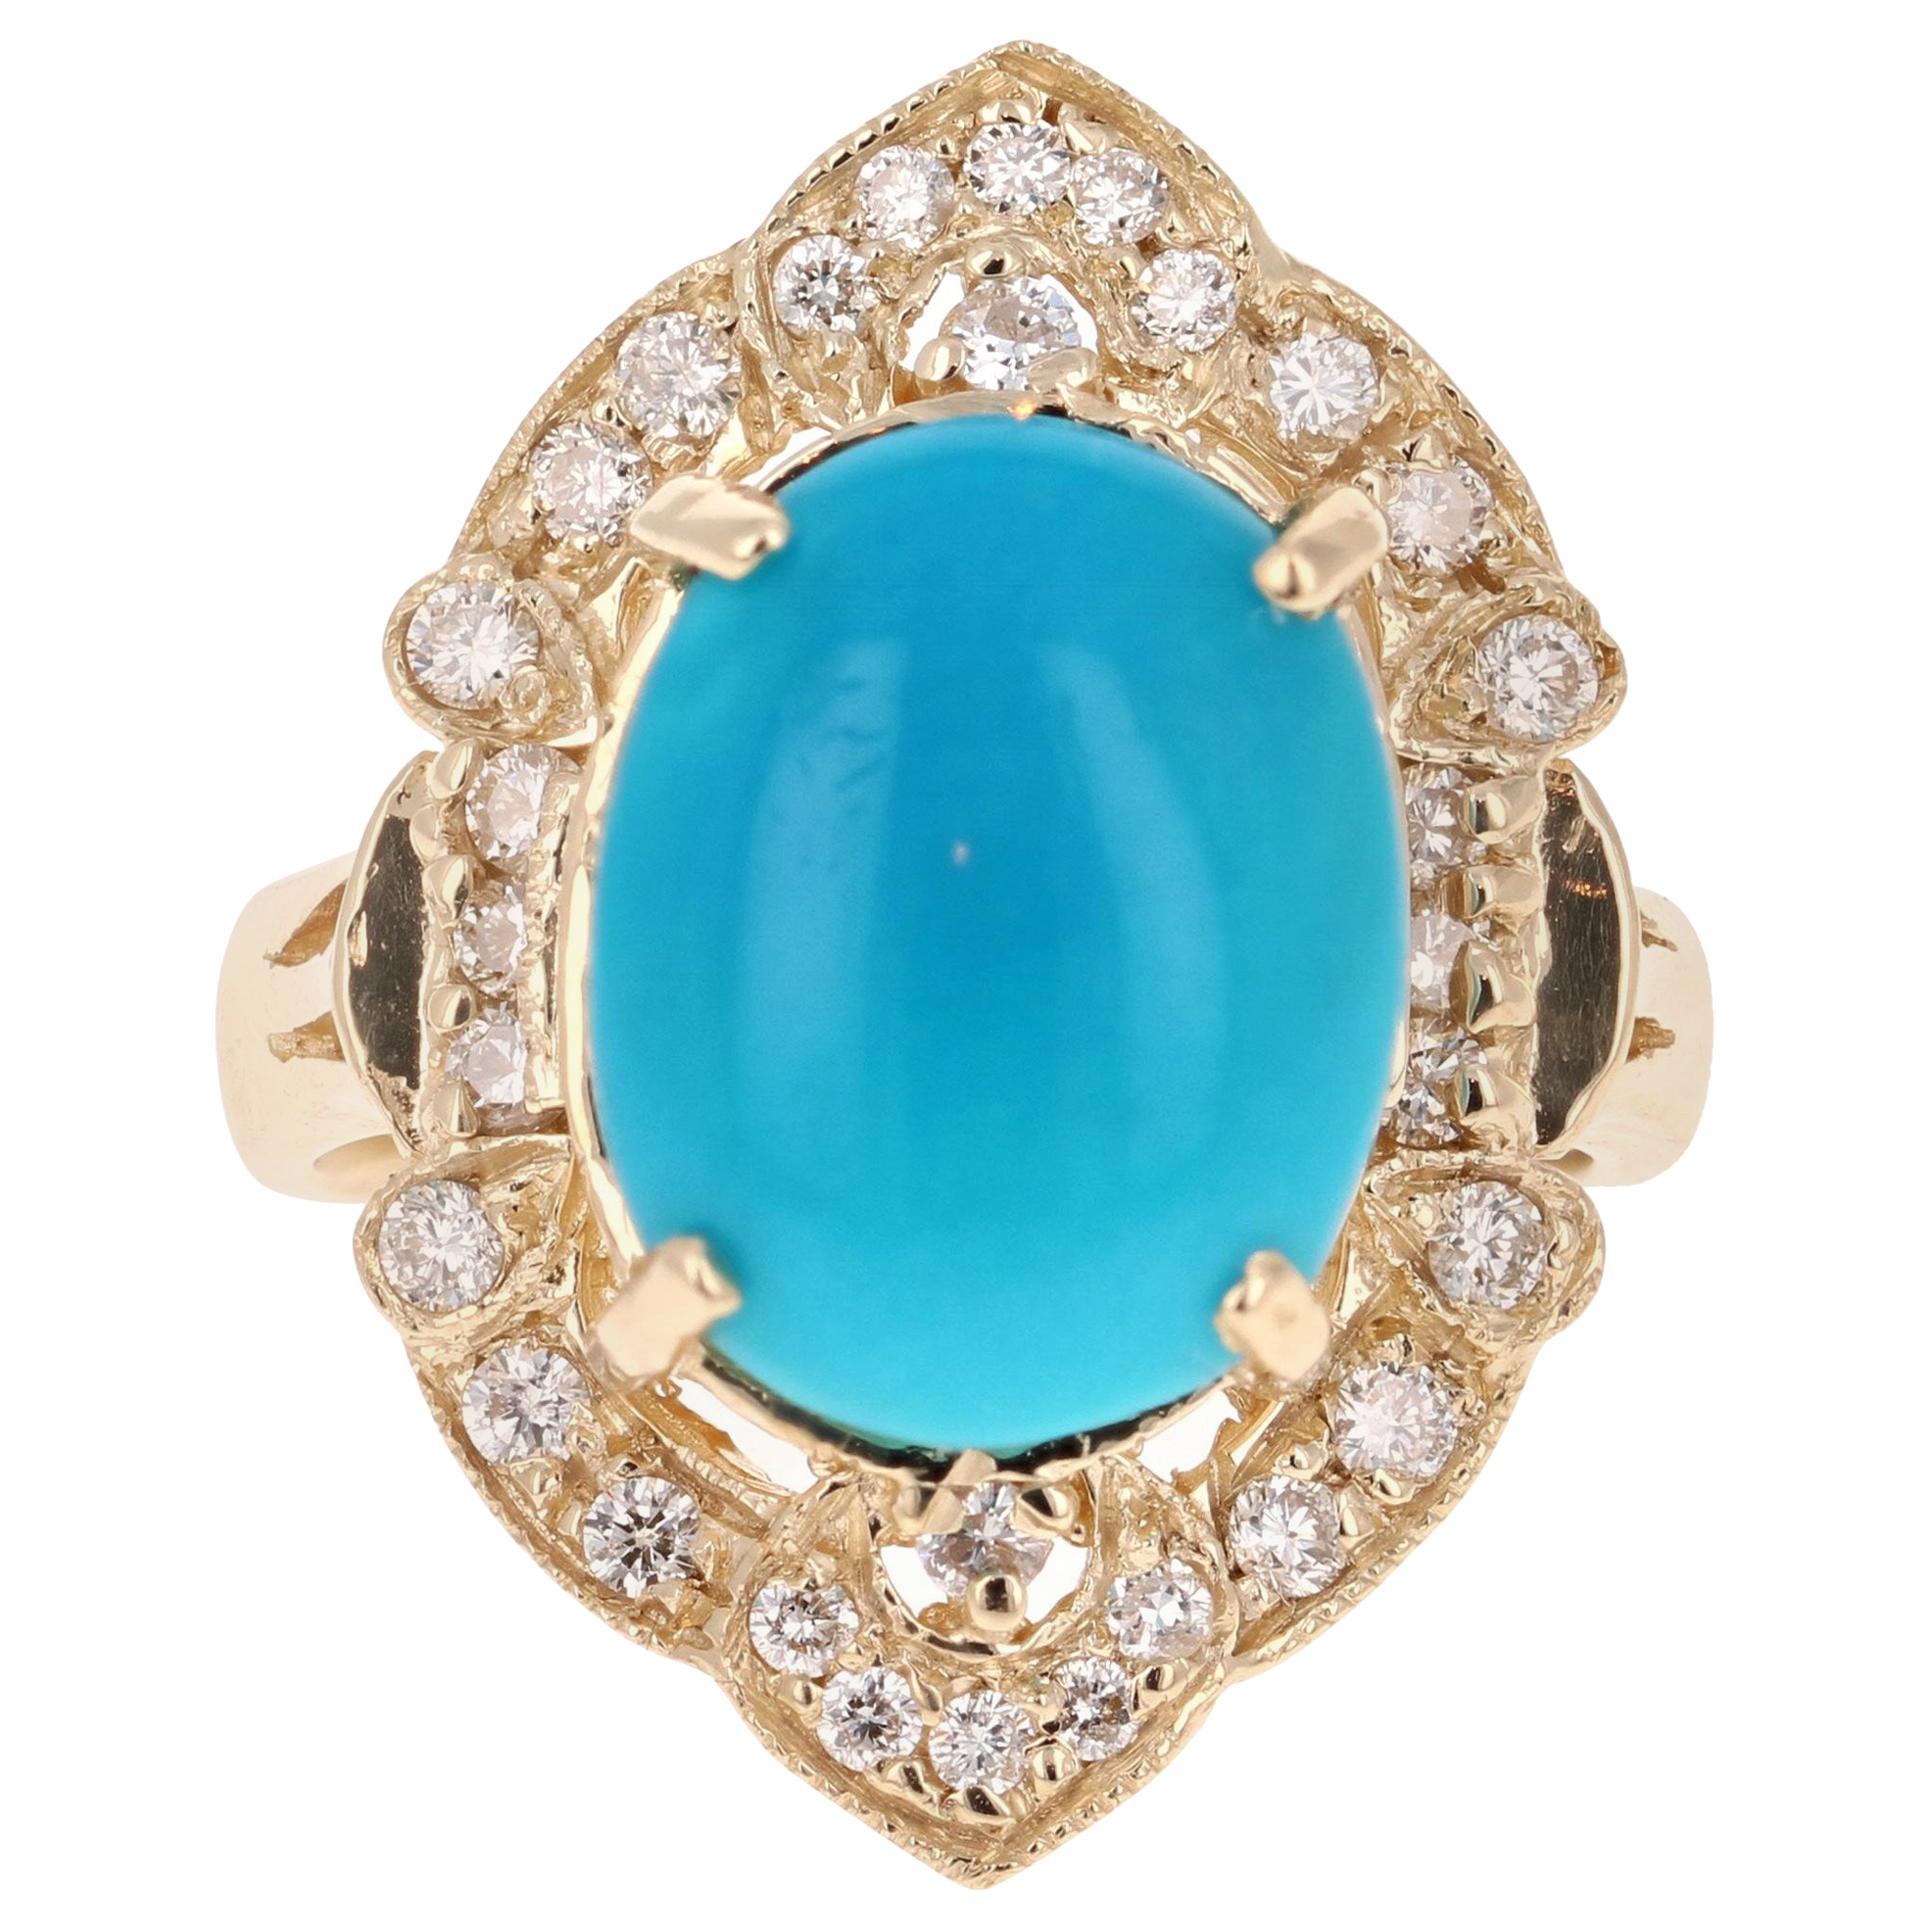 5.33 Carat Turquoise Diamond Yellow Gold Art Deco Style Ring